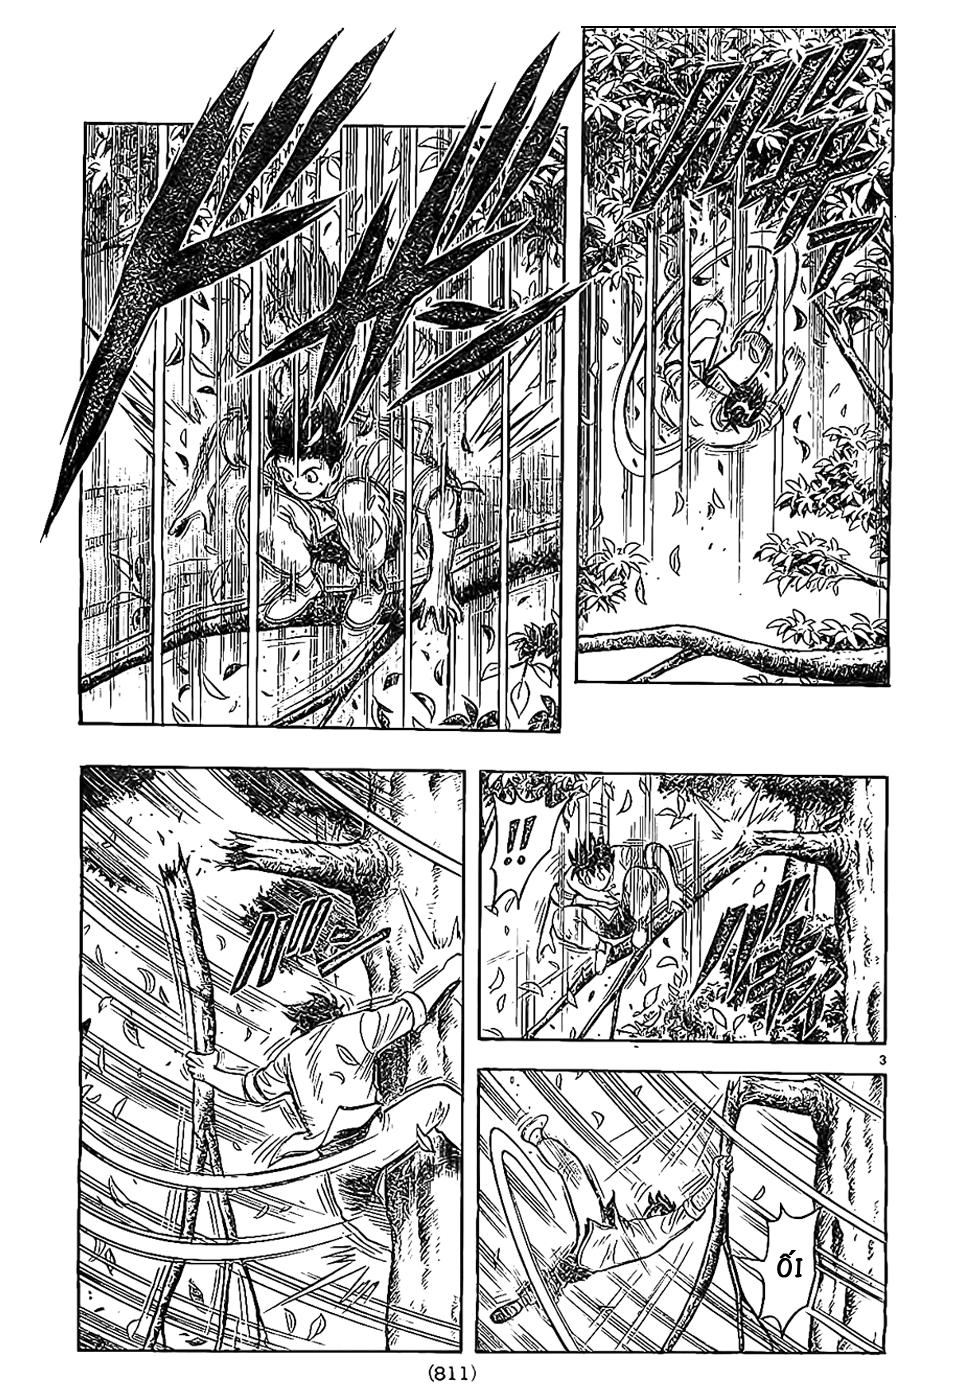 Hoàng Phi Hồng Phần 4 chap 86 Trang 4